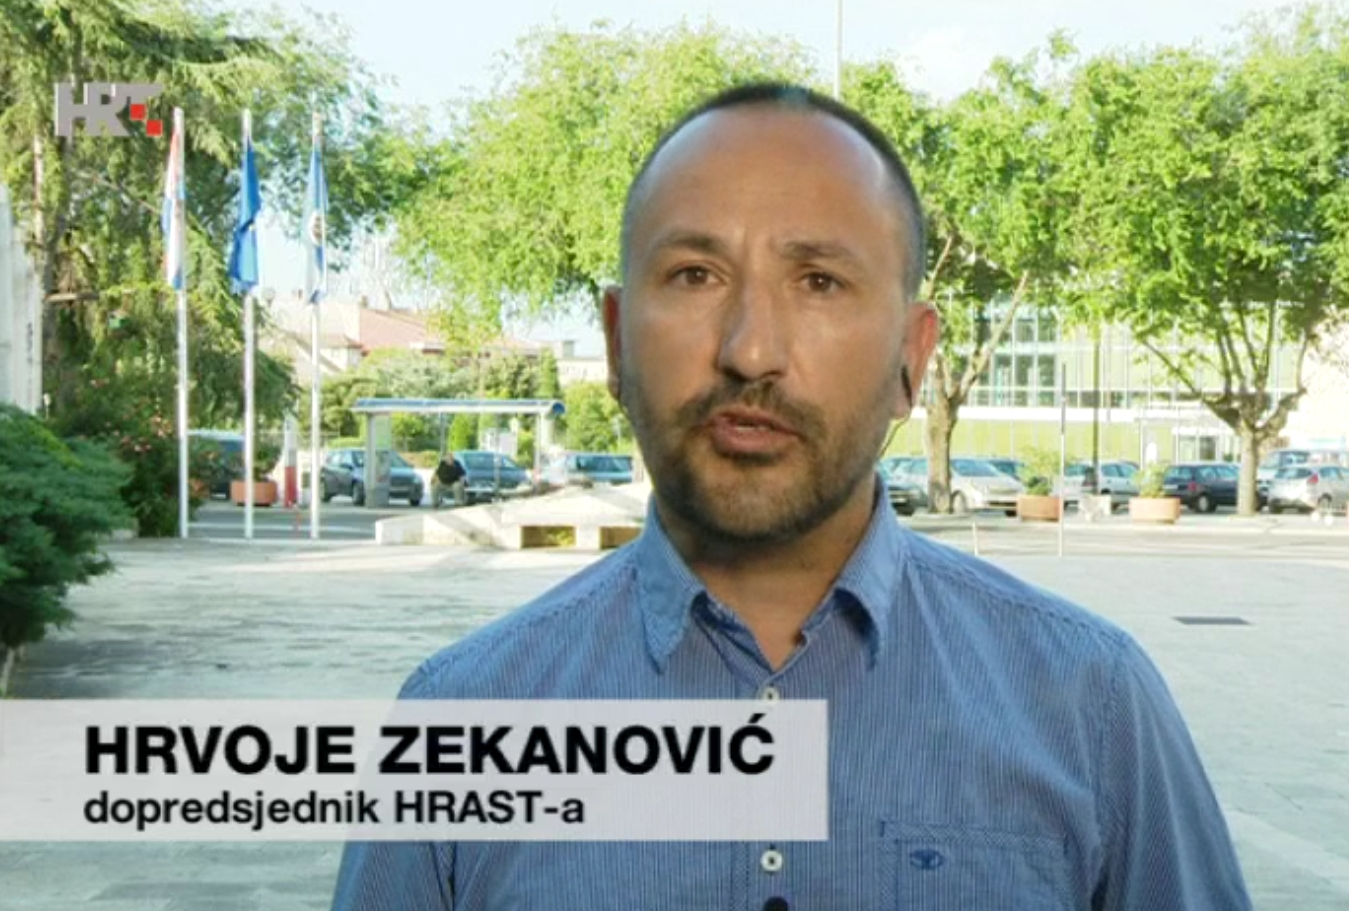 Hrvoje Zekanović hrast